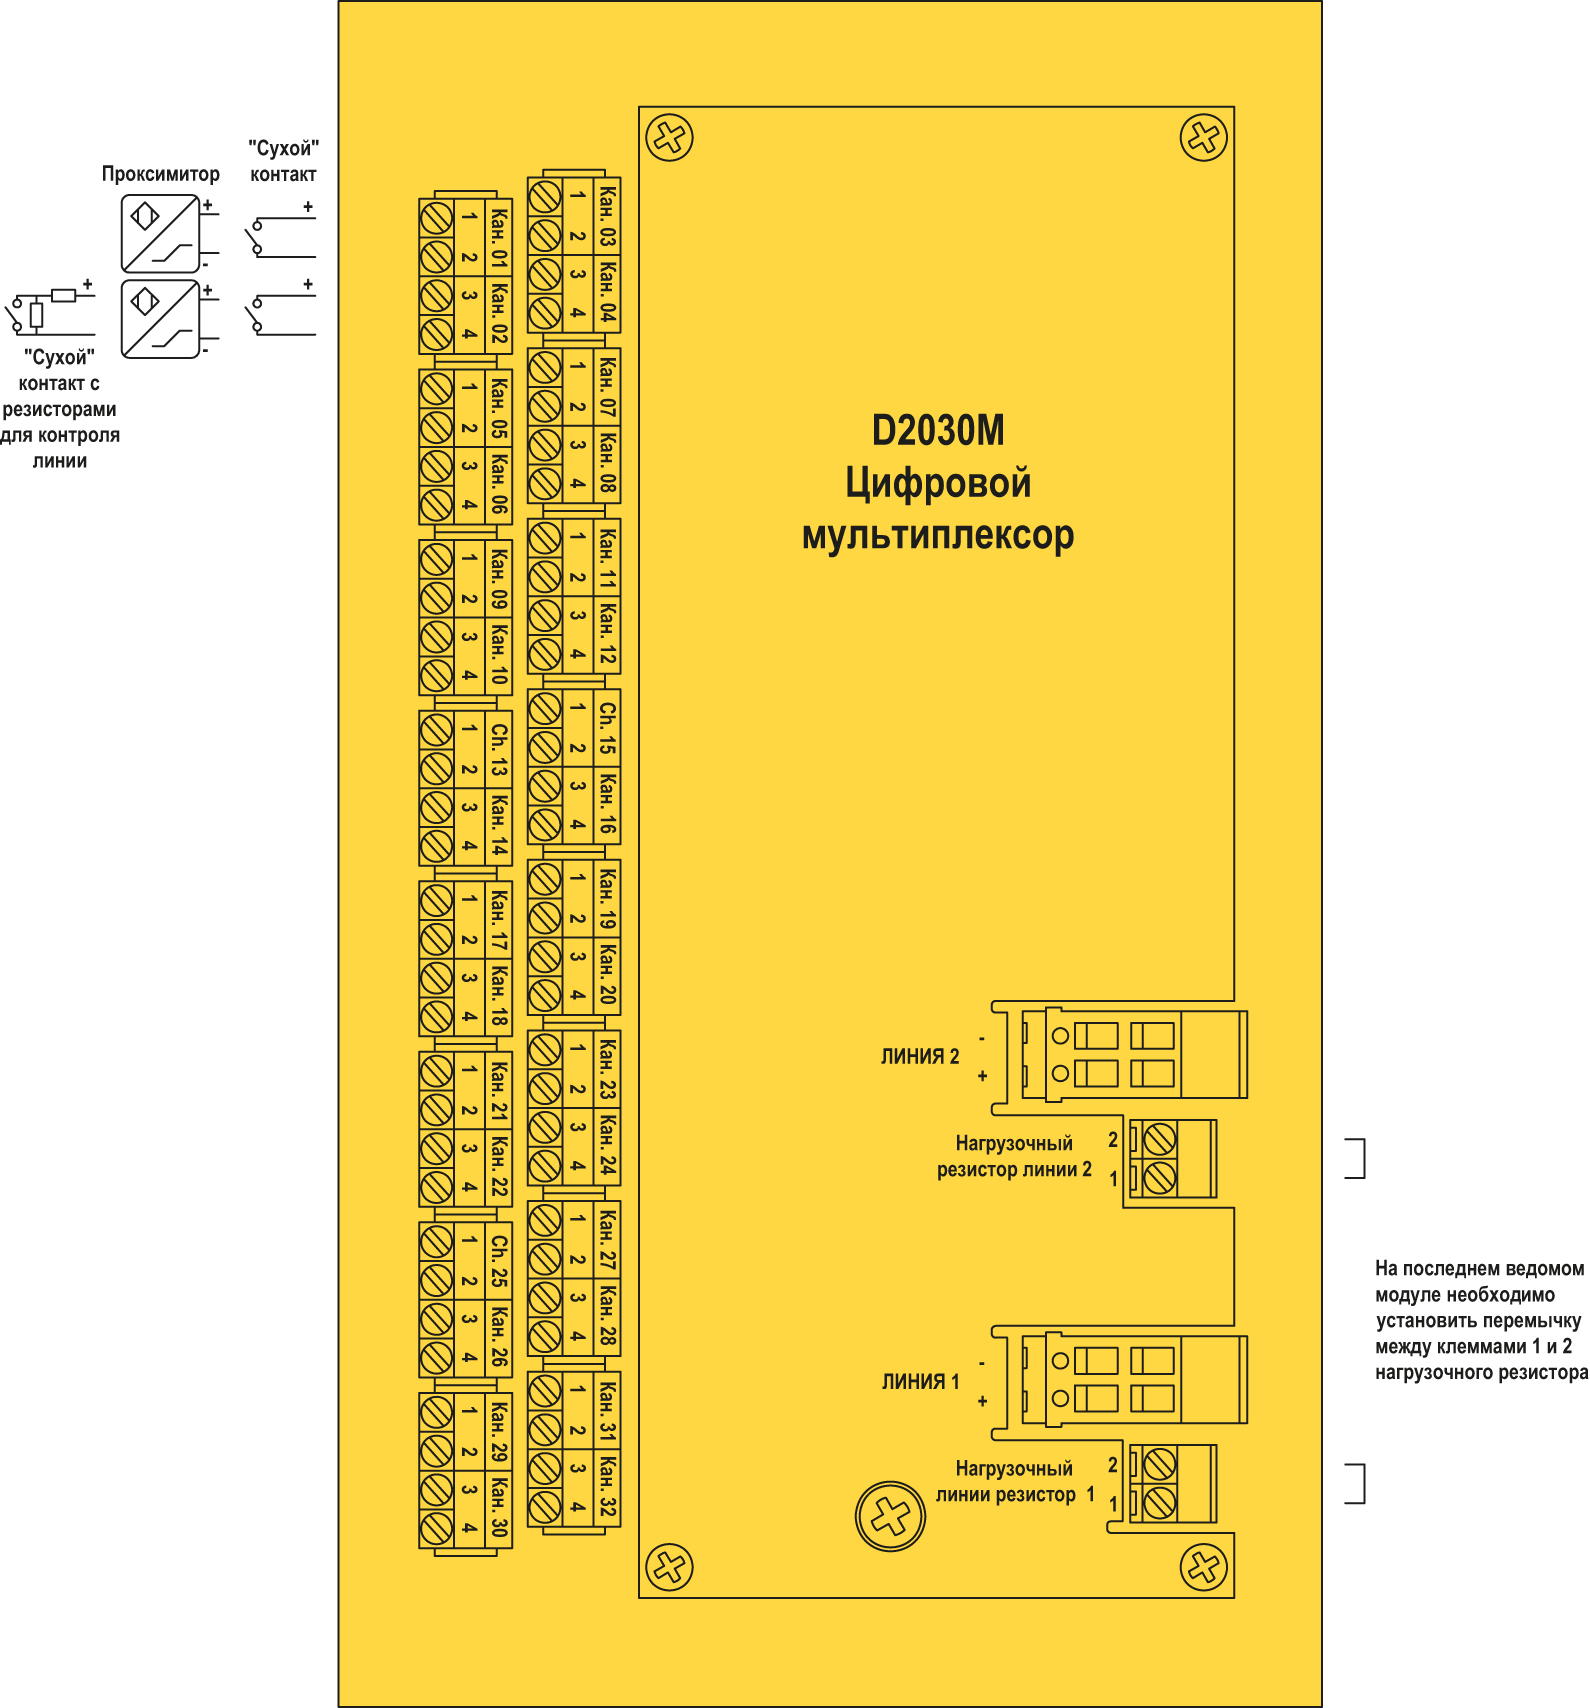 Функциональная схема модуля искробезопасного цифрового мультиплексора D2030M